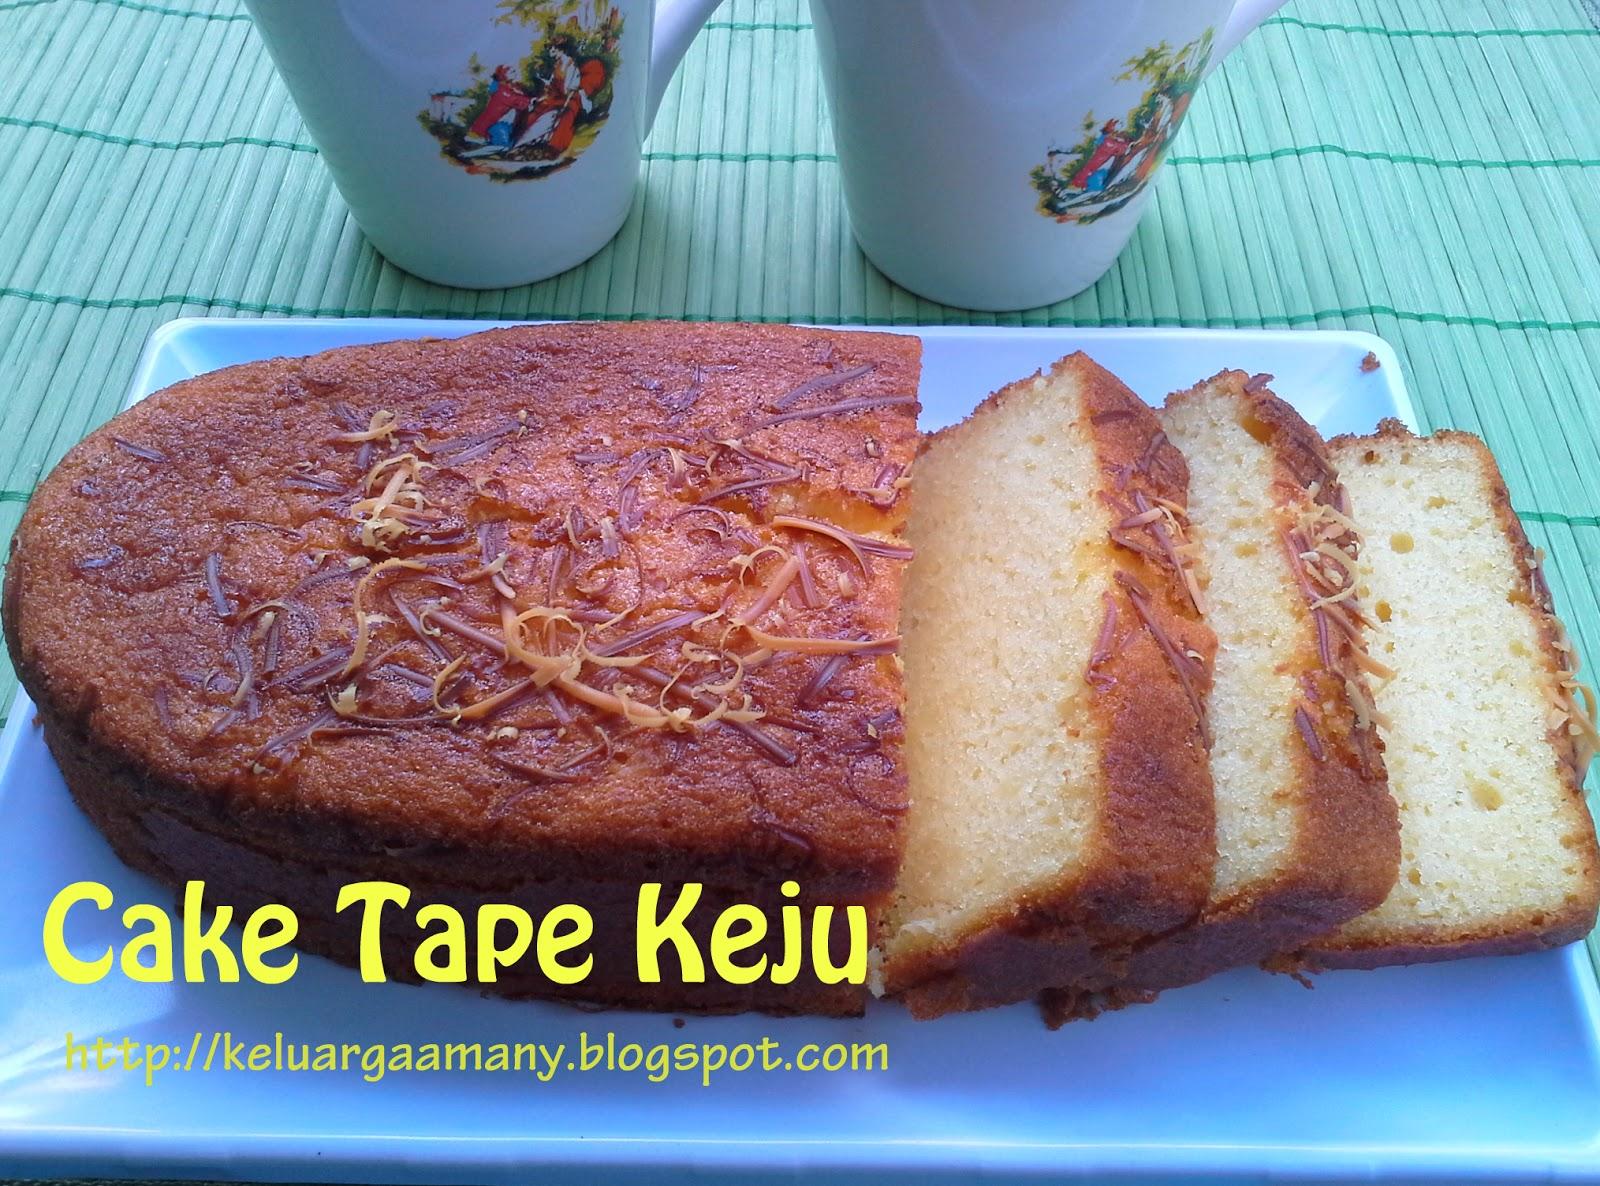 Resep Cake Berhantu Ncc: Keluarga Kami: Cake Tape Keju